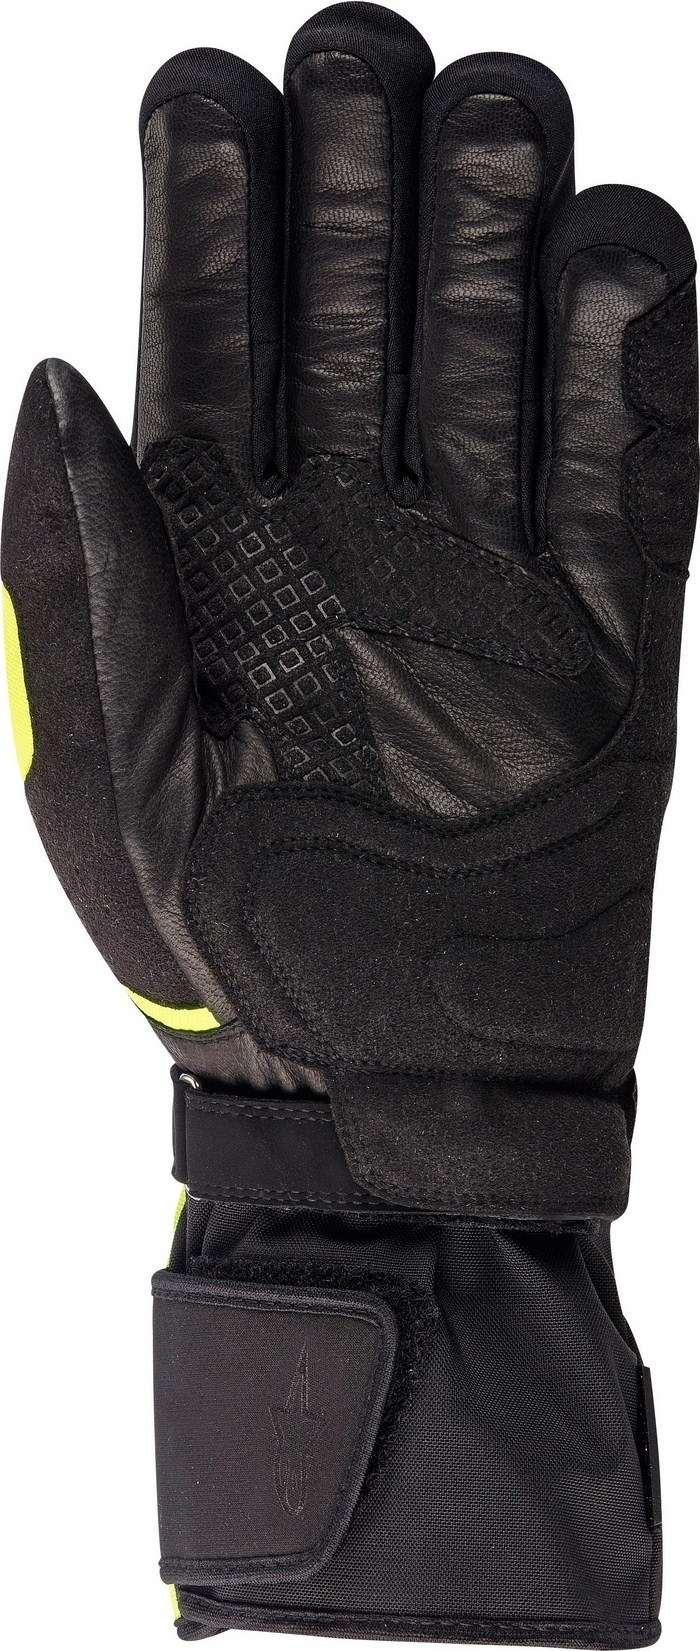 Heated Motorcycle Gloves Black Alpinestars Celsius